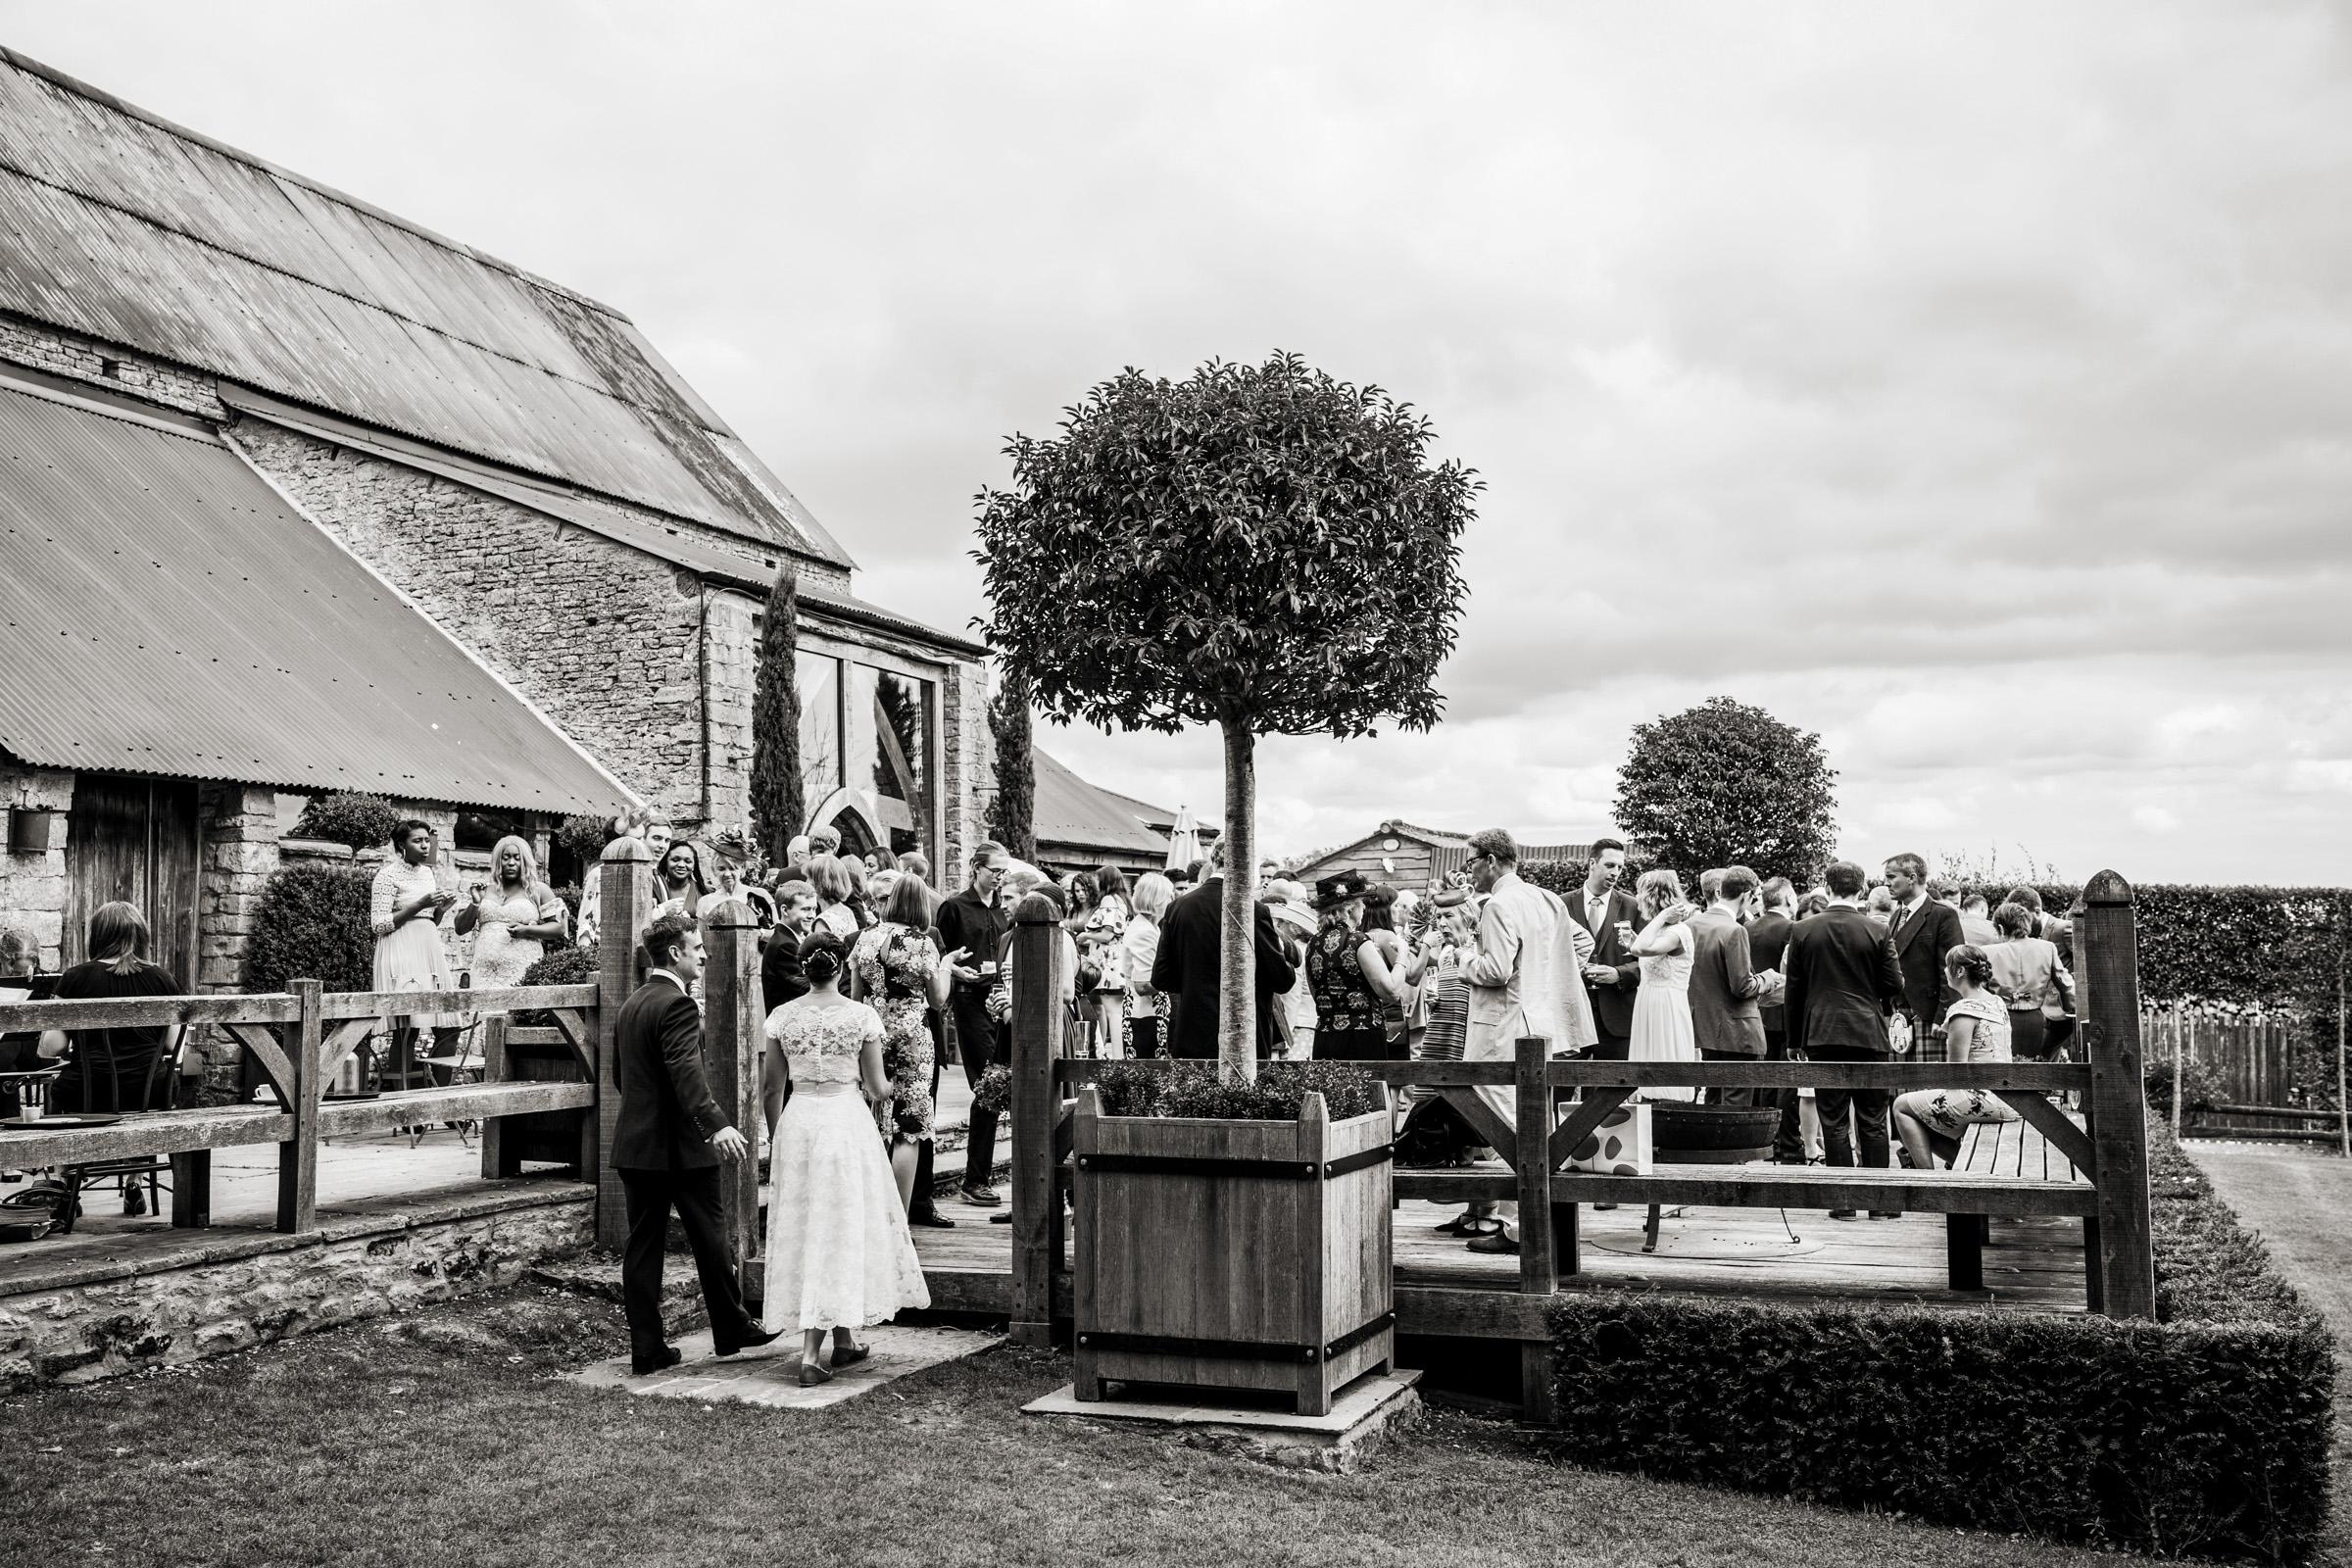 Cripps Barn Bibury Cotswolds Wedding Photography 020.jpg